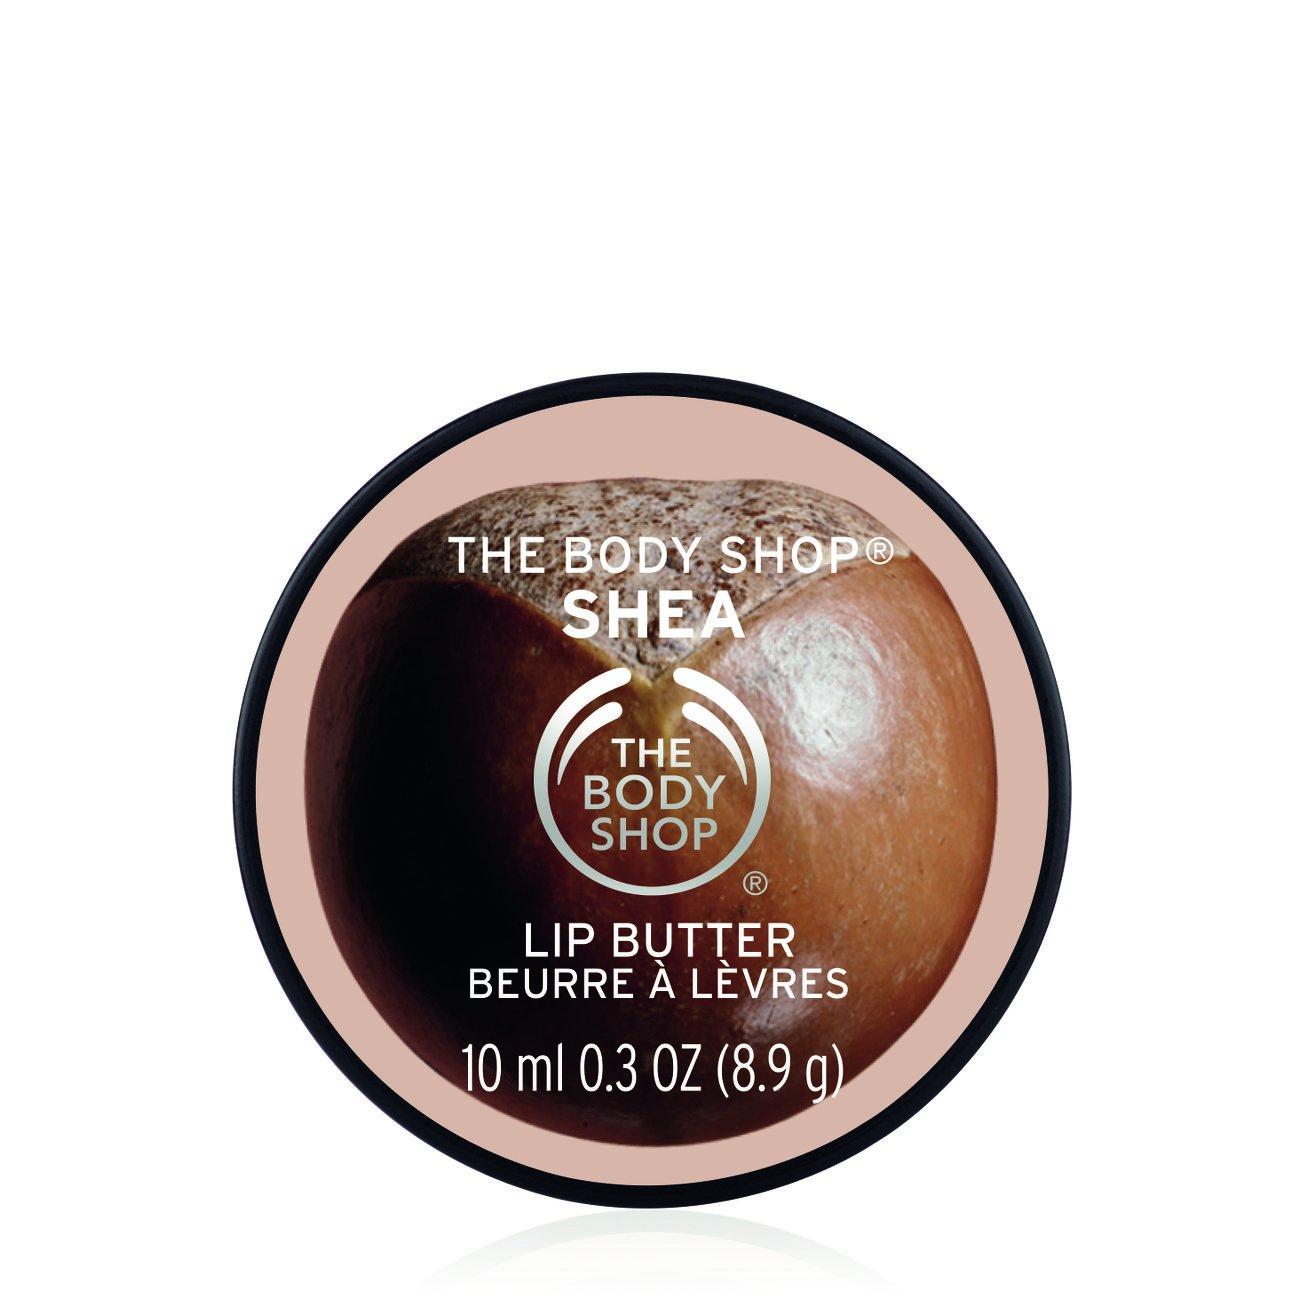 The Body Shop Shea Lip Butter 10ml HealthCentre